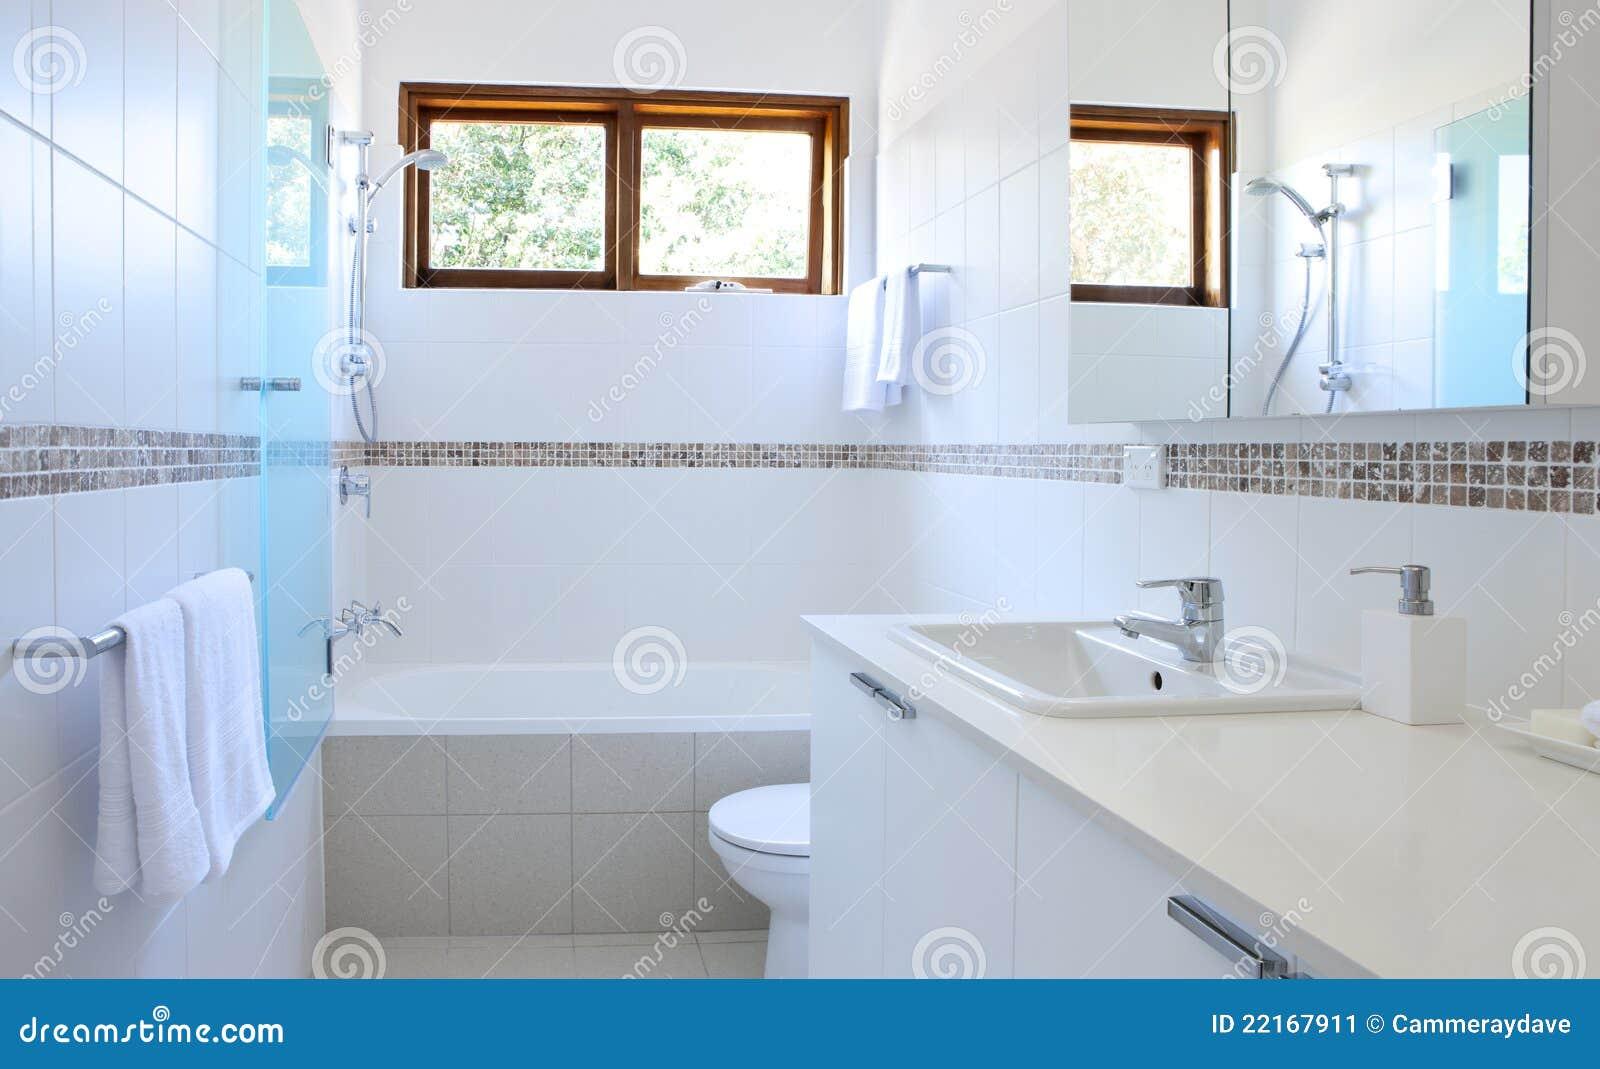 Pin Banheiras De Canto Banheiro Pequeno Banheira Banheiros Luxo on  #82A229 1300x885 Banheiro Com Banheira De Canto